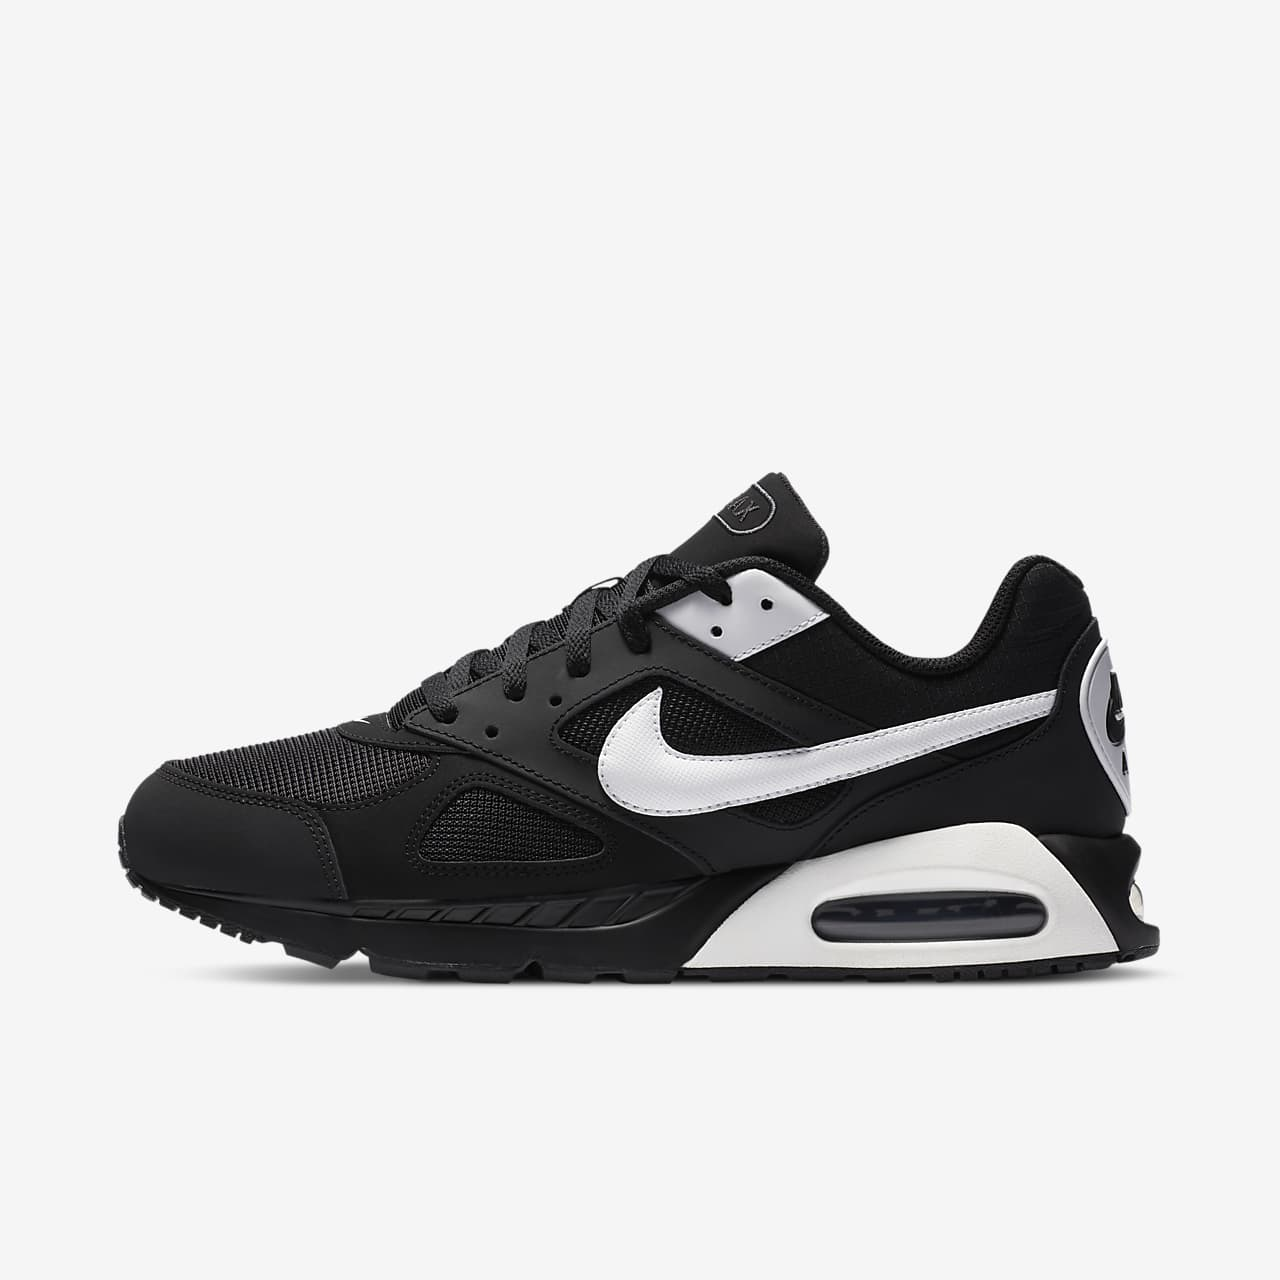 new style 493c8 5da15 ... Sko Nike Air Max IVO för män